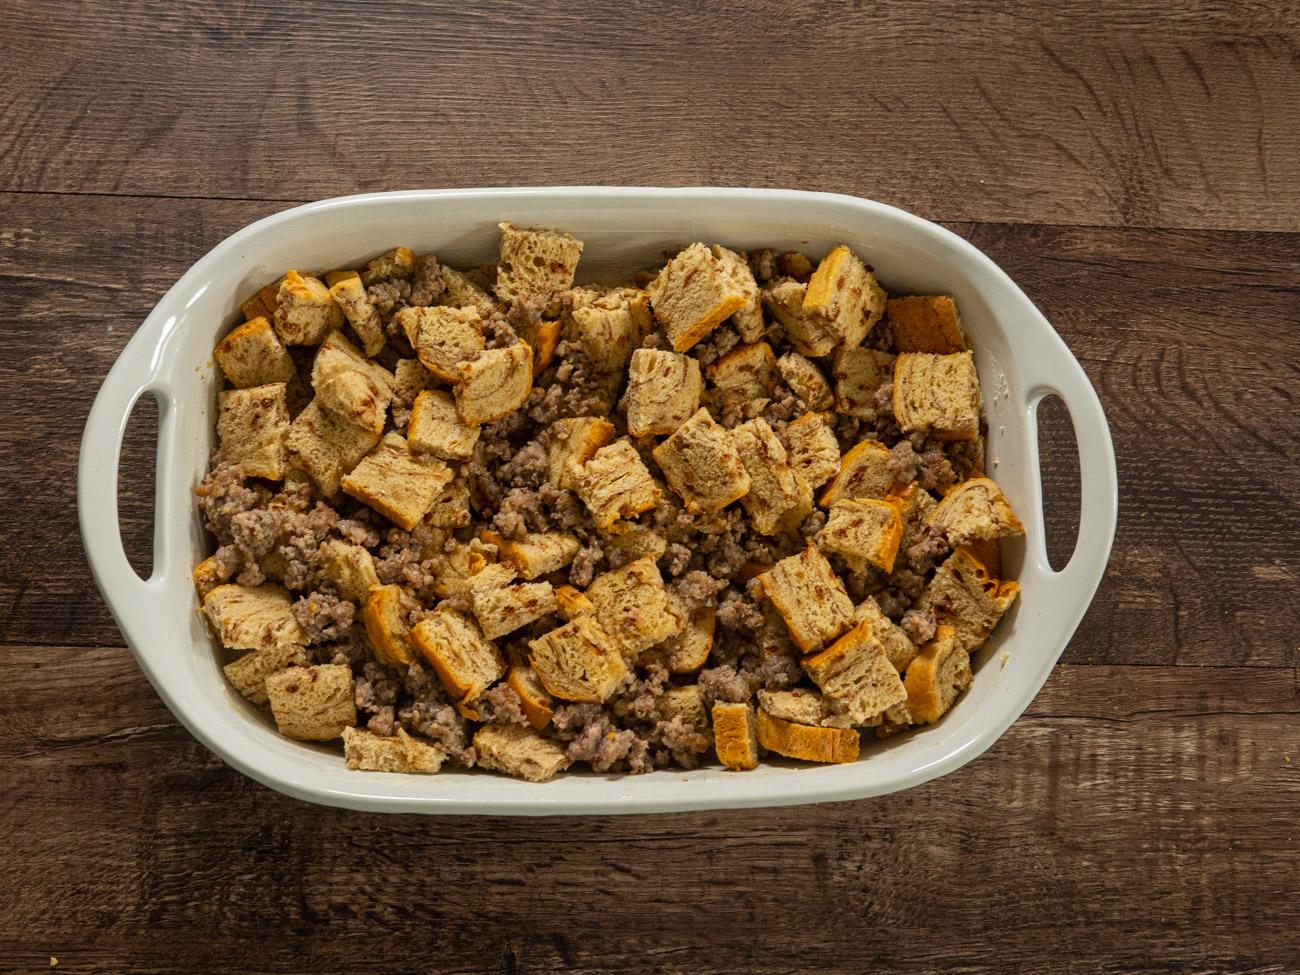 Raisin Bread Sausage Casserole preparation